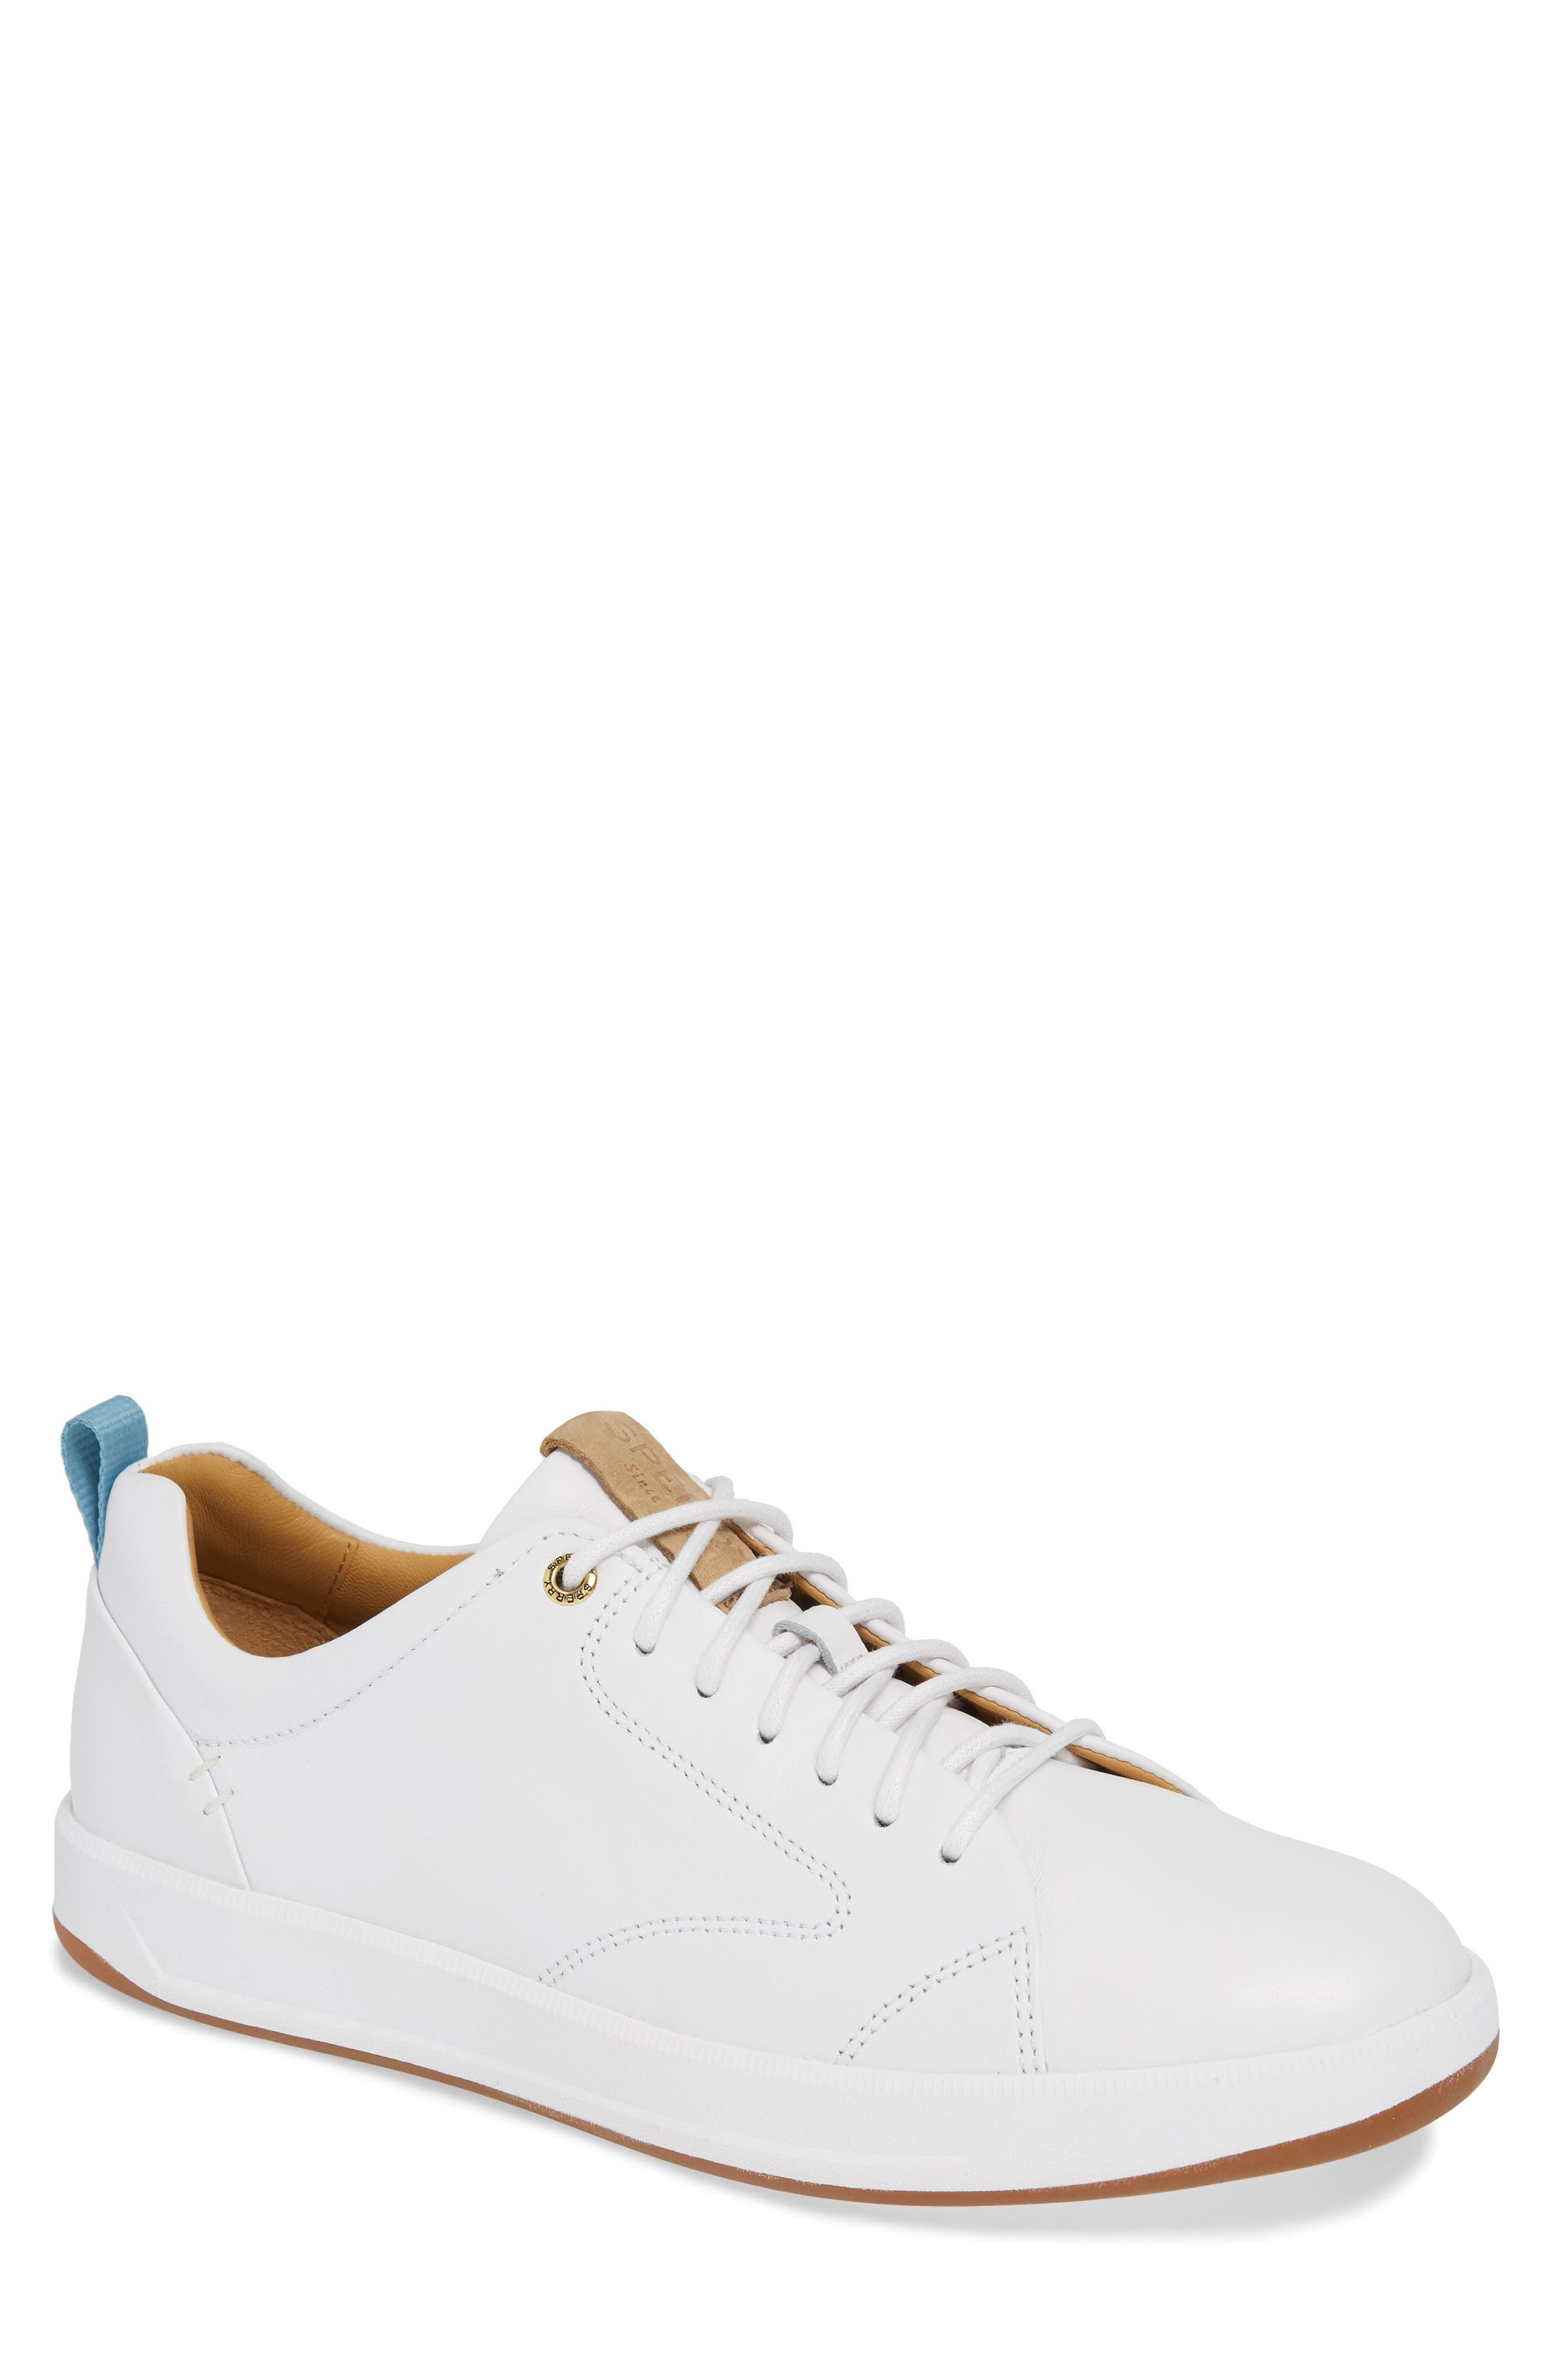 Sperry Gold Cup Richfield Ltt Sneaker, White